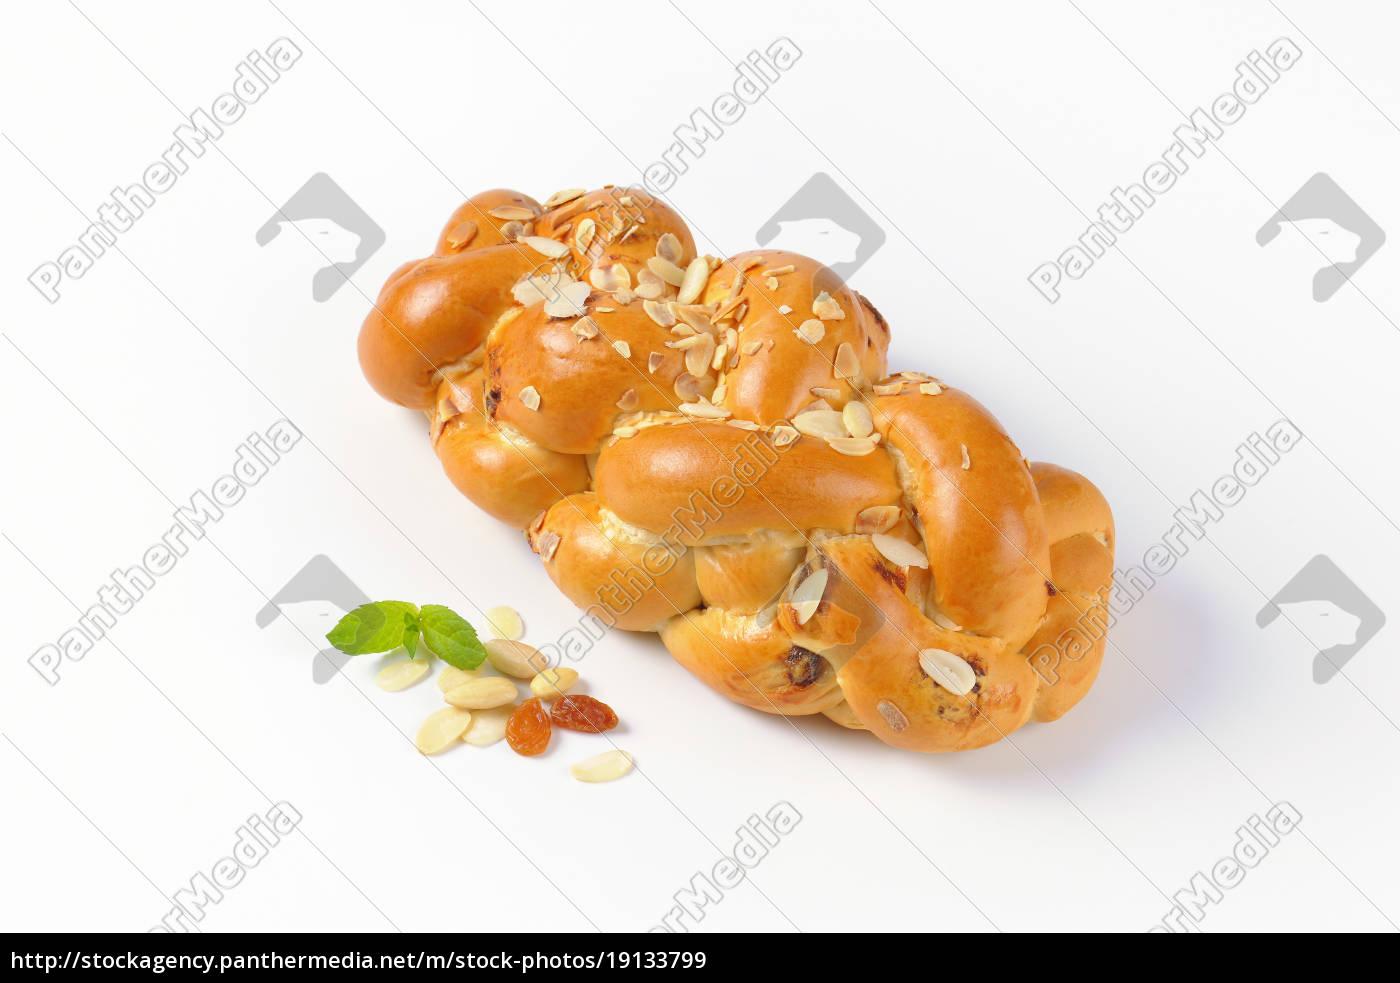 sweet, braided, bread - 19133799